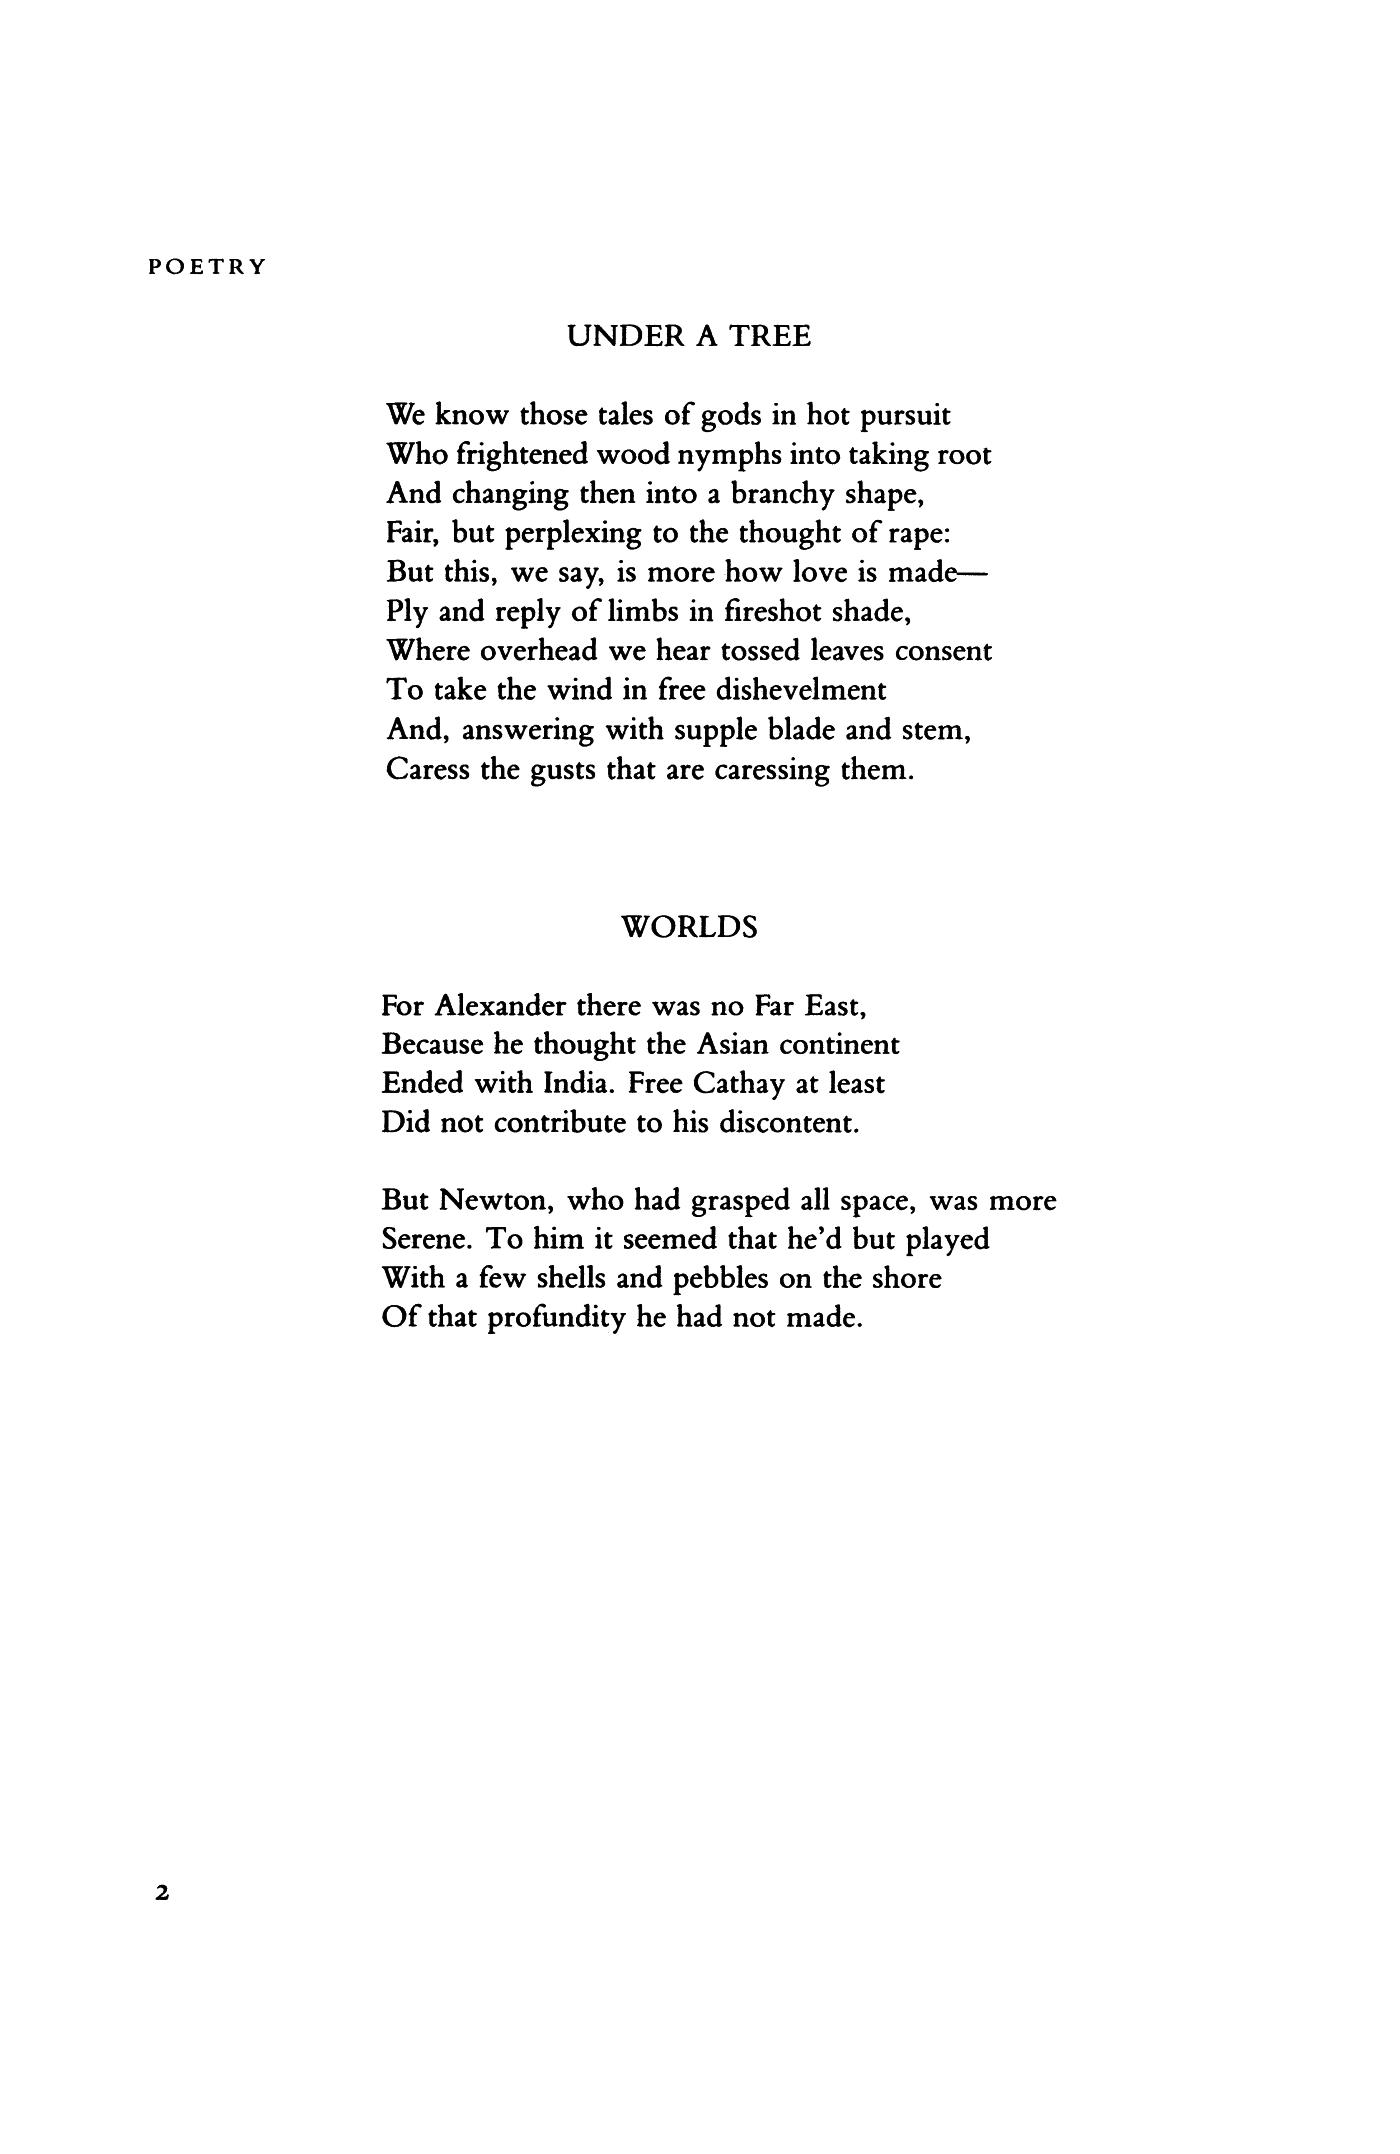 worlds by richard wilbur under a tree by richard wilbur poetry